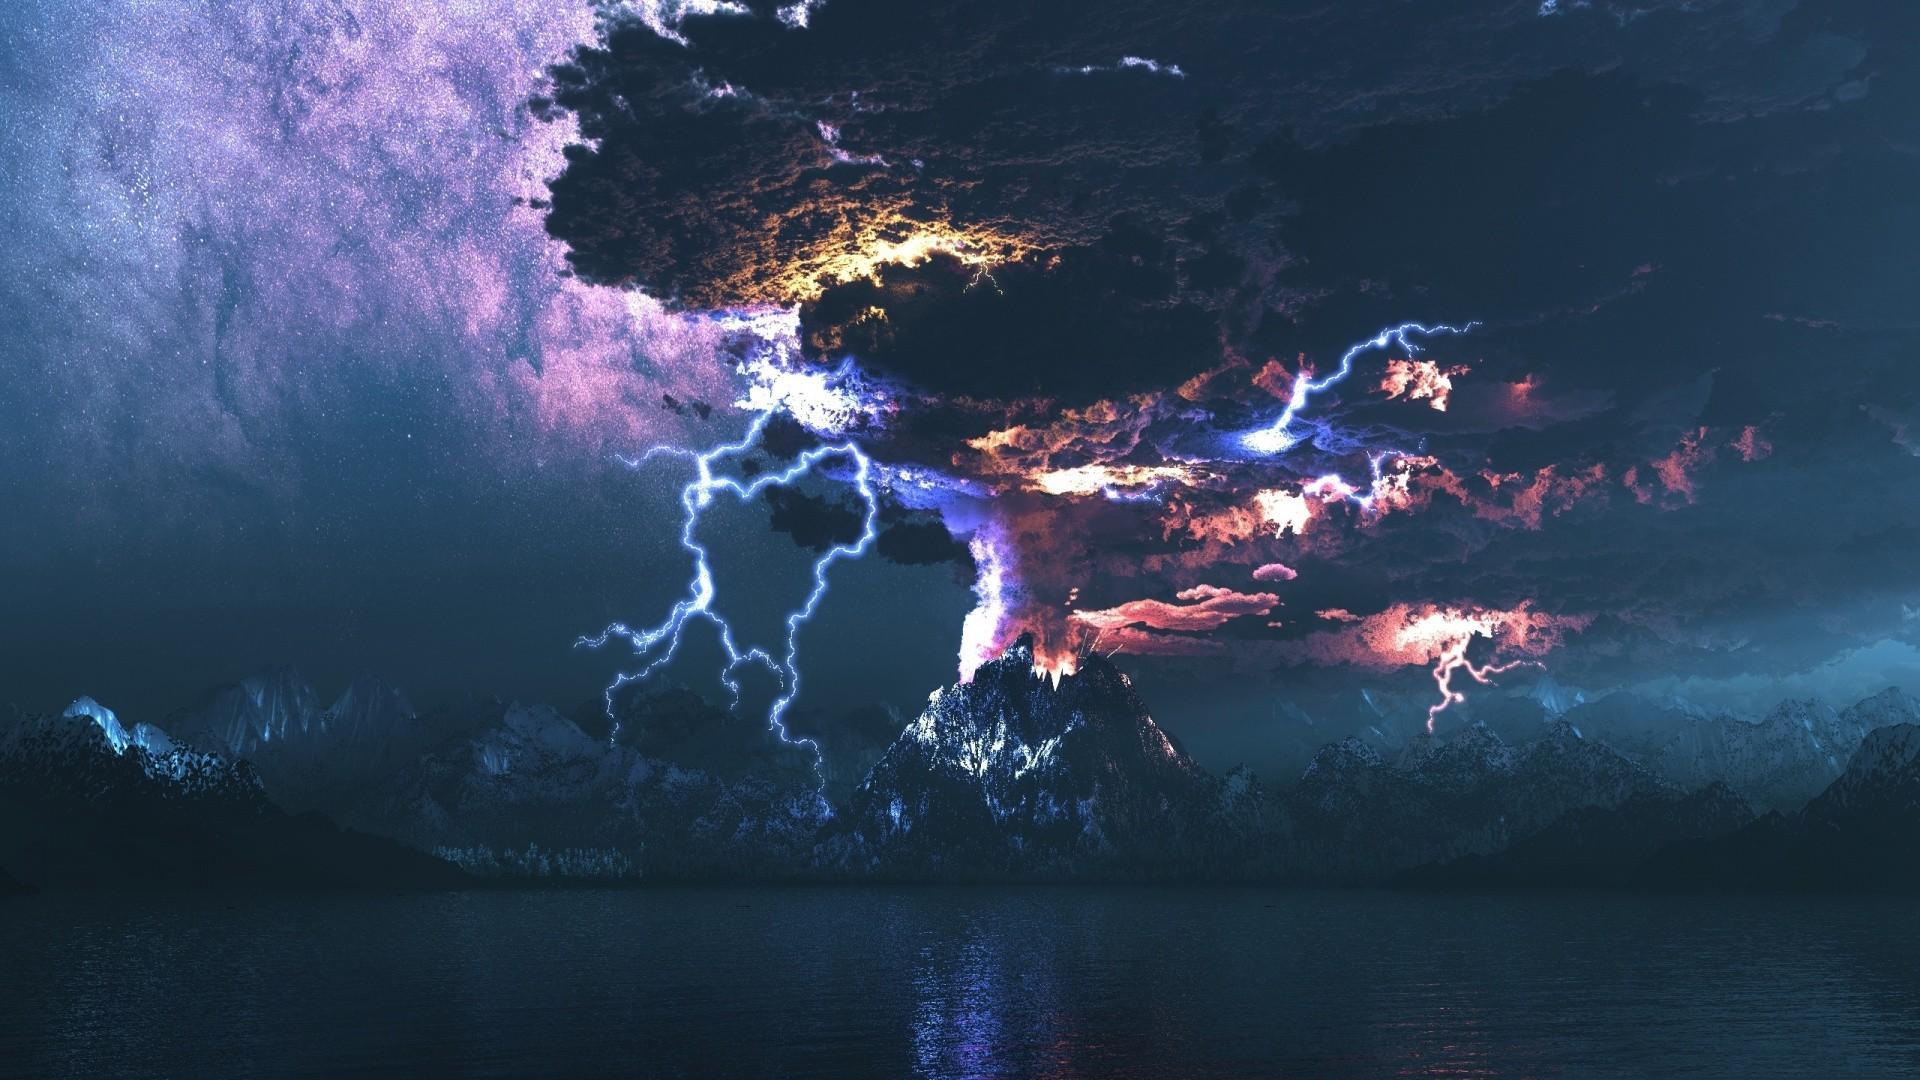 Download Storm Wallpaper Hd Backgrounds Download Itlcat